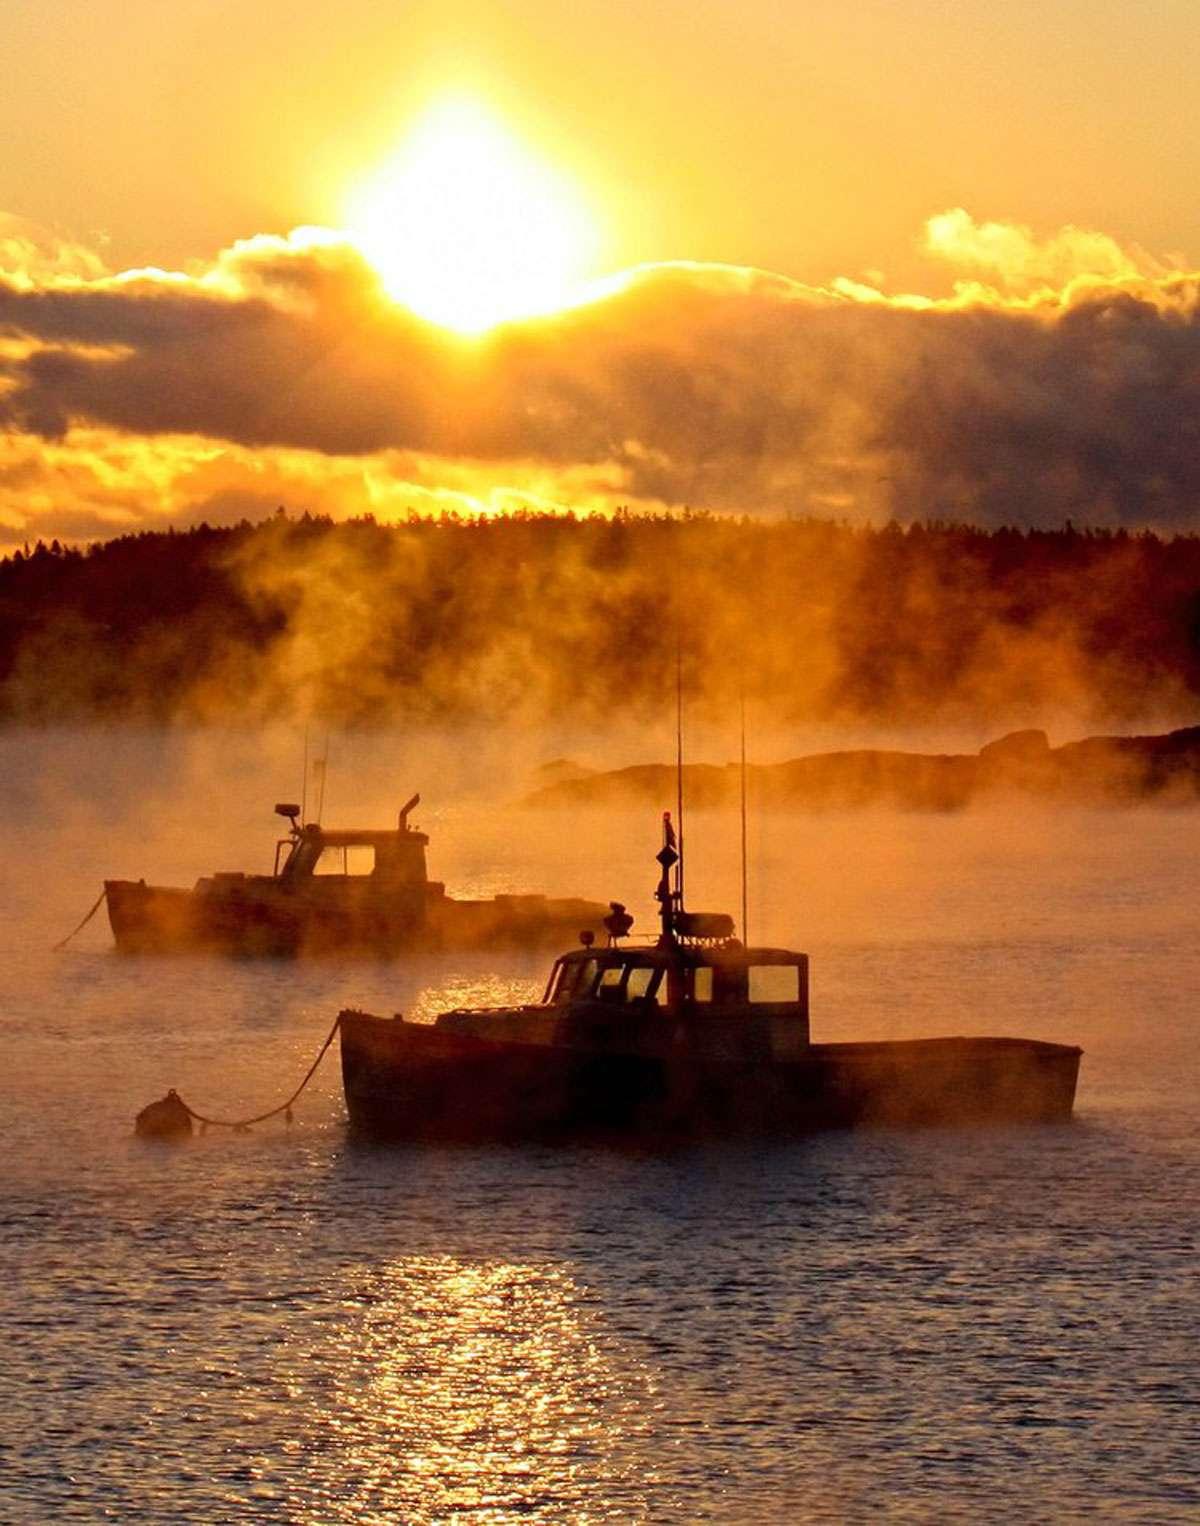 Sunrise & arctic vapor with two boats. Photo: Julie Eaton